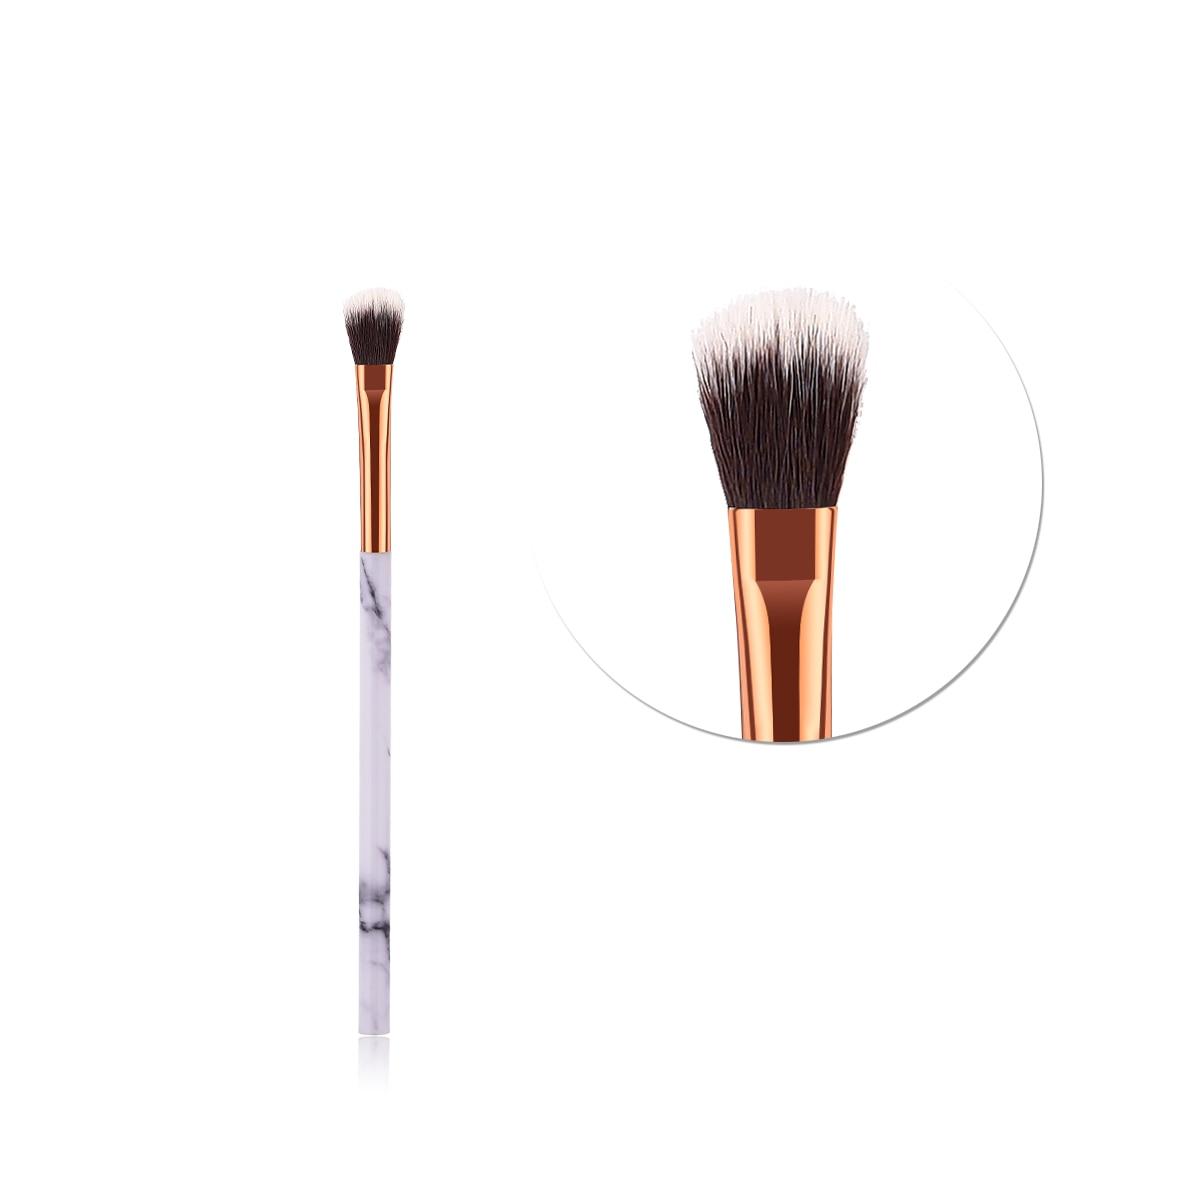 ELECOOL 1pcs Makeup Brush Marble Texture Handle With Nylon Hair Makeup Brush For Eye Shadow Portable Selling Hot Single Brush